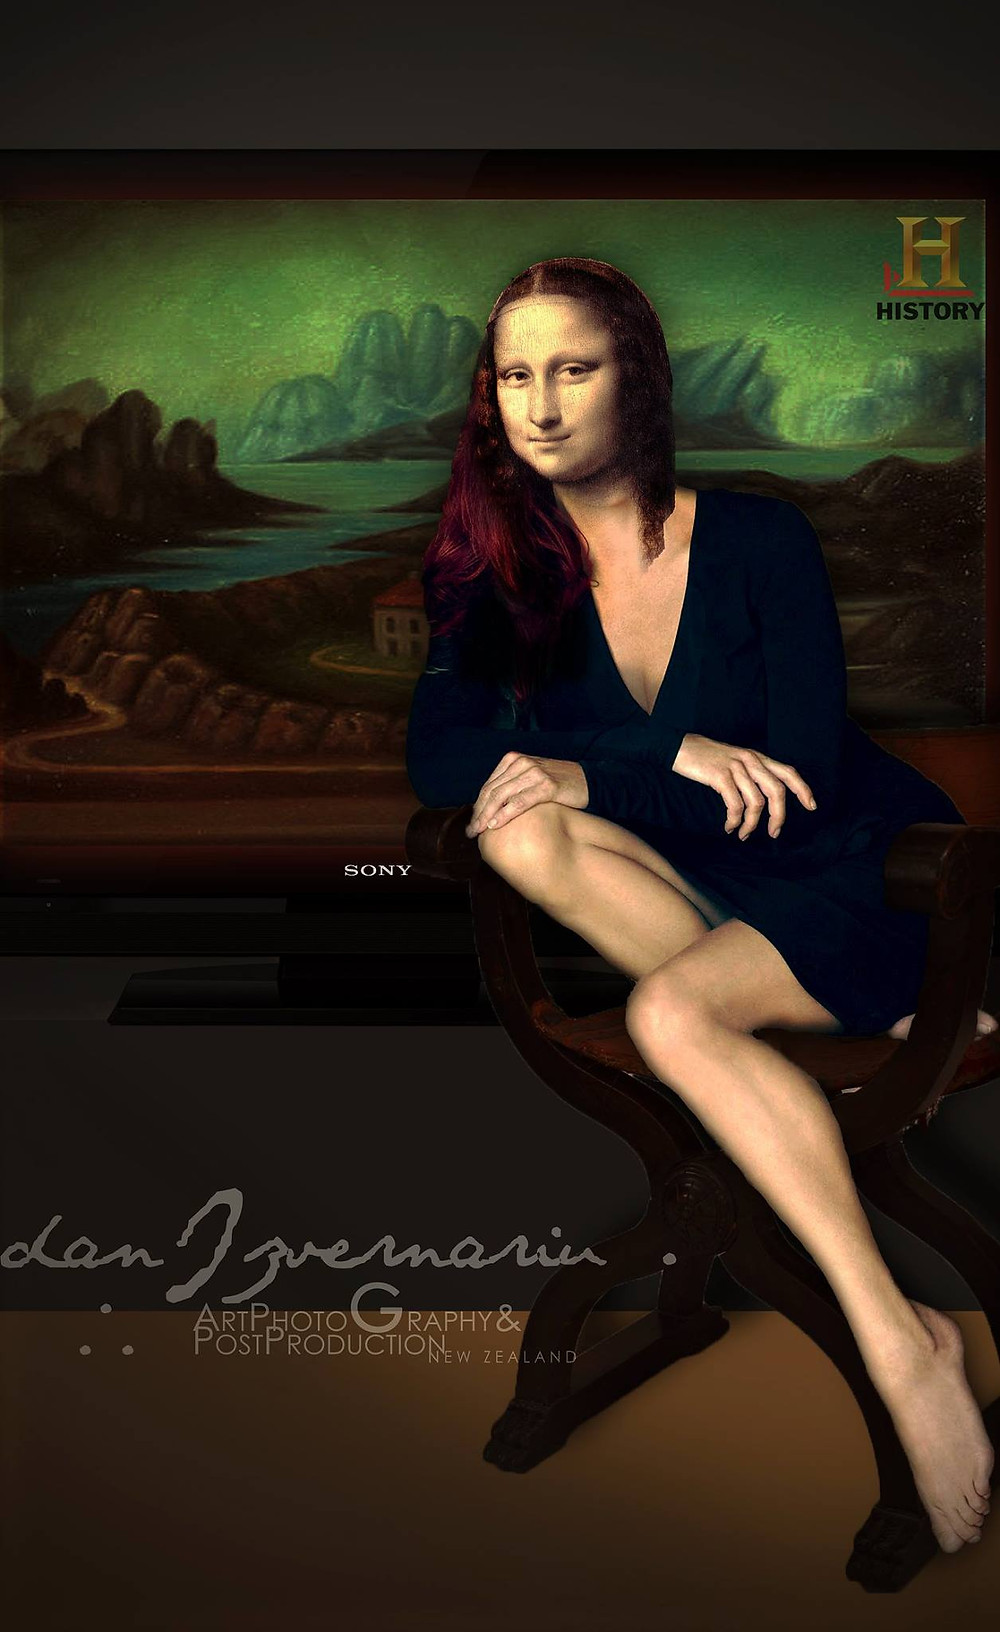 Mona Lisa plasma SONY by Dan Izvernariu, Madrid, España